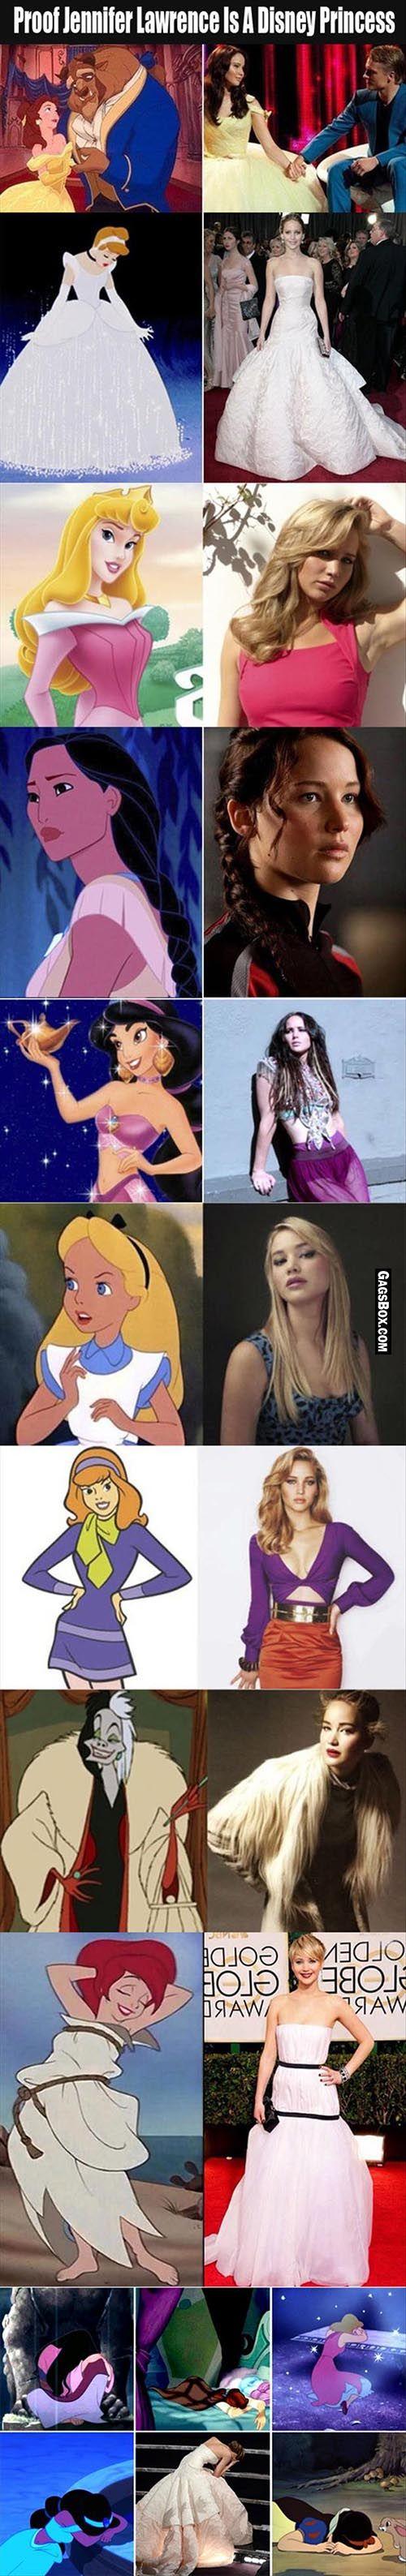 Ha but since when are Curella De Vil and Daphne Disney princesses?... Scooby Doo isn't even Disney.